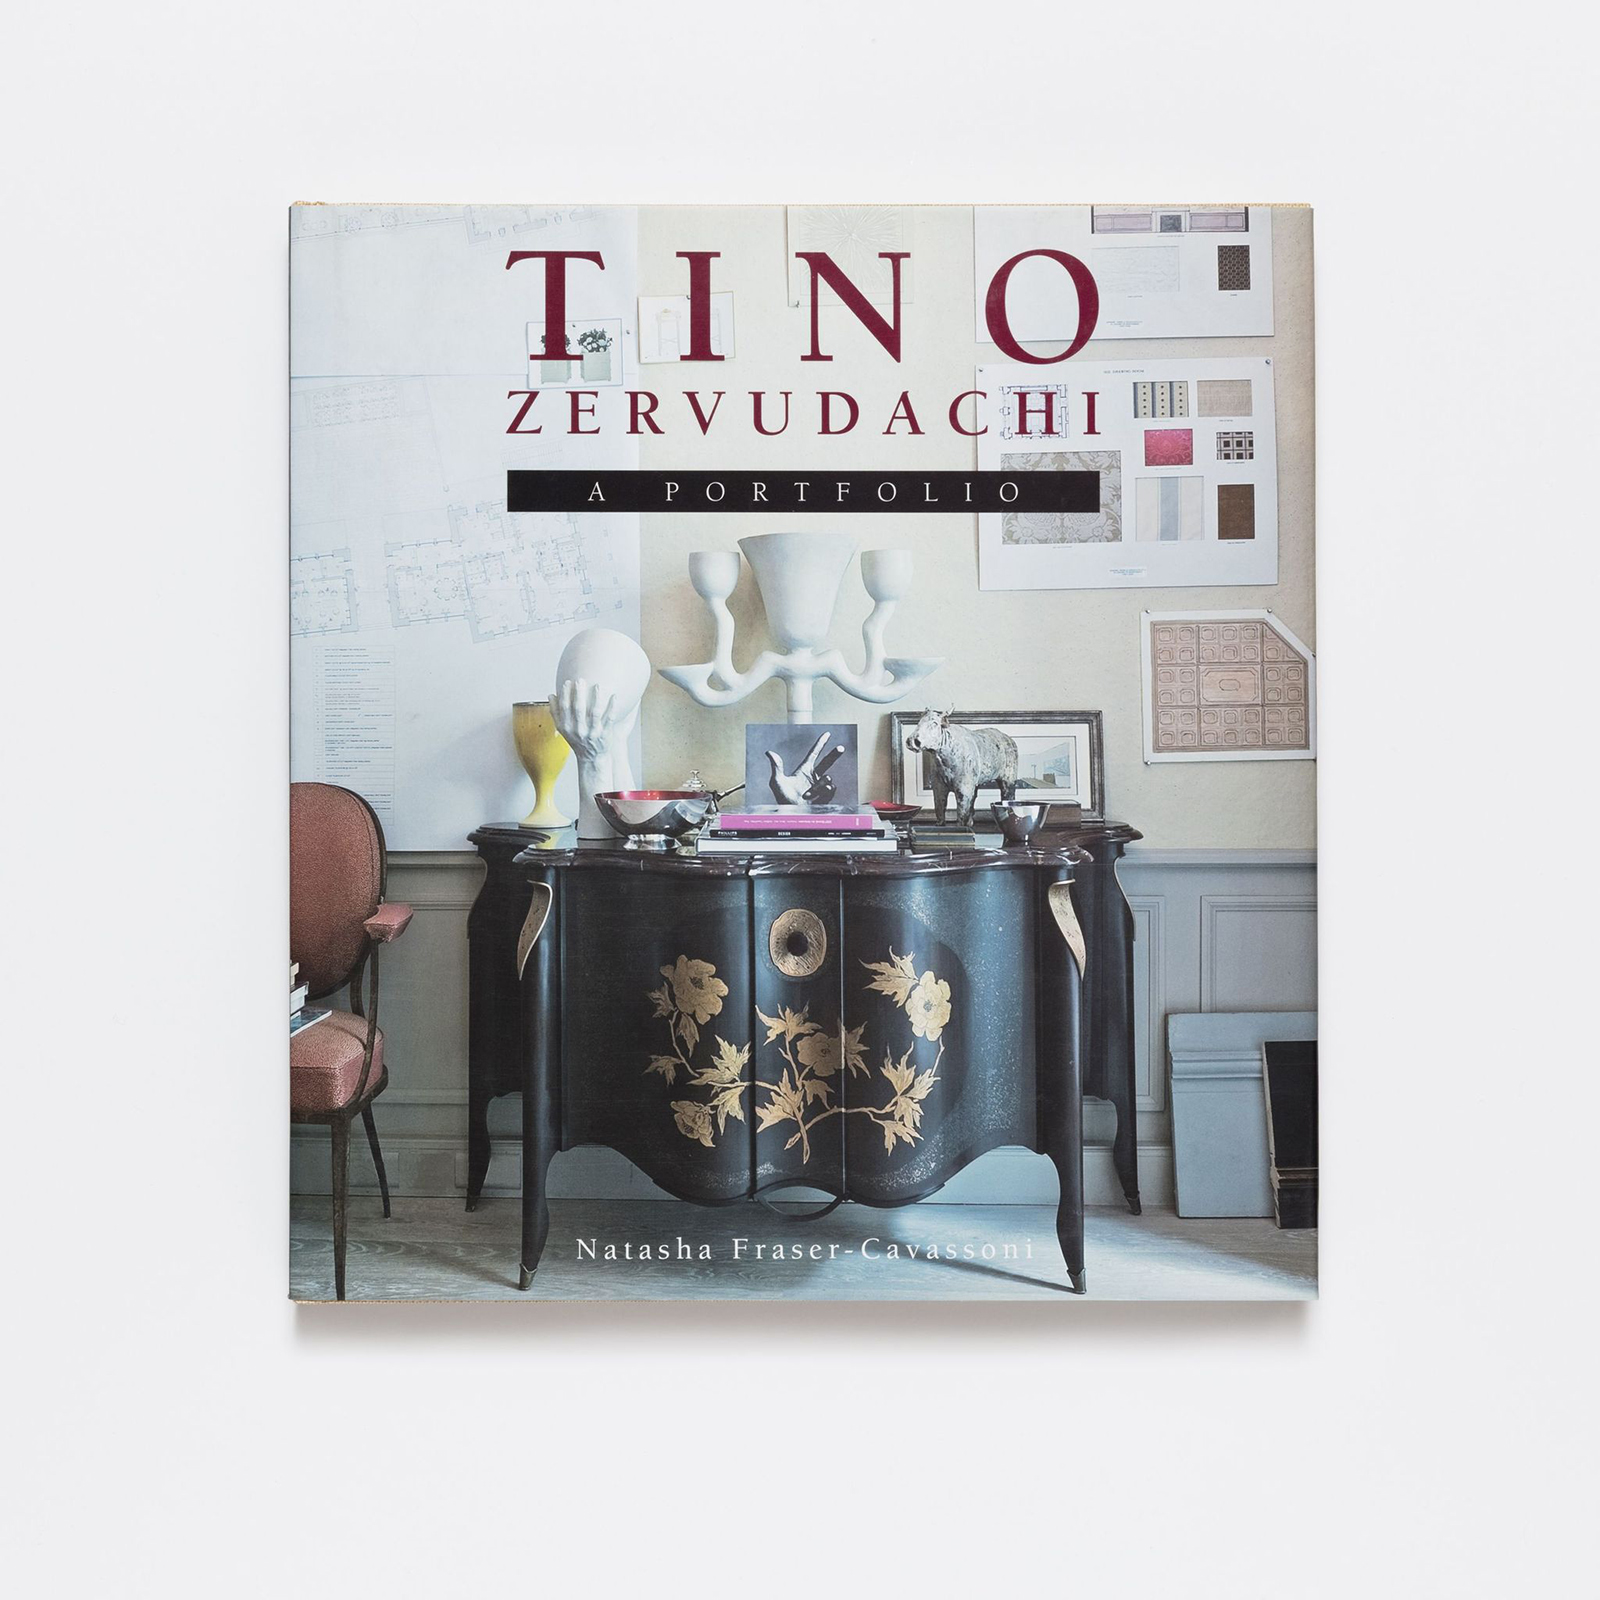 TINO ZERVUDACHI - A PORTFOLIO POINTED LEAF PRESS - DECEMBER 2012 1